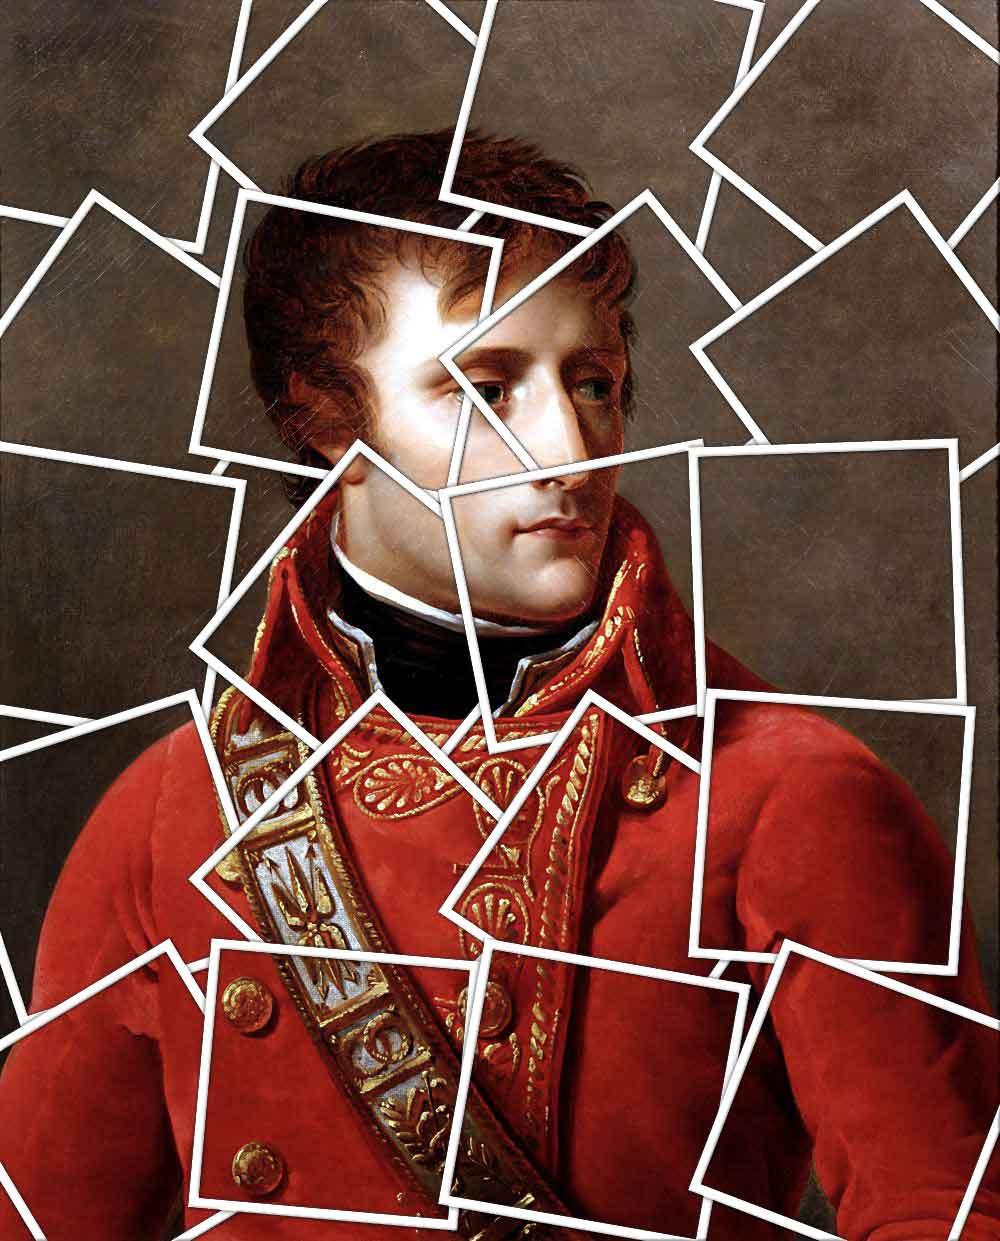 Napoleone by Gros